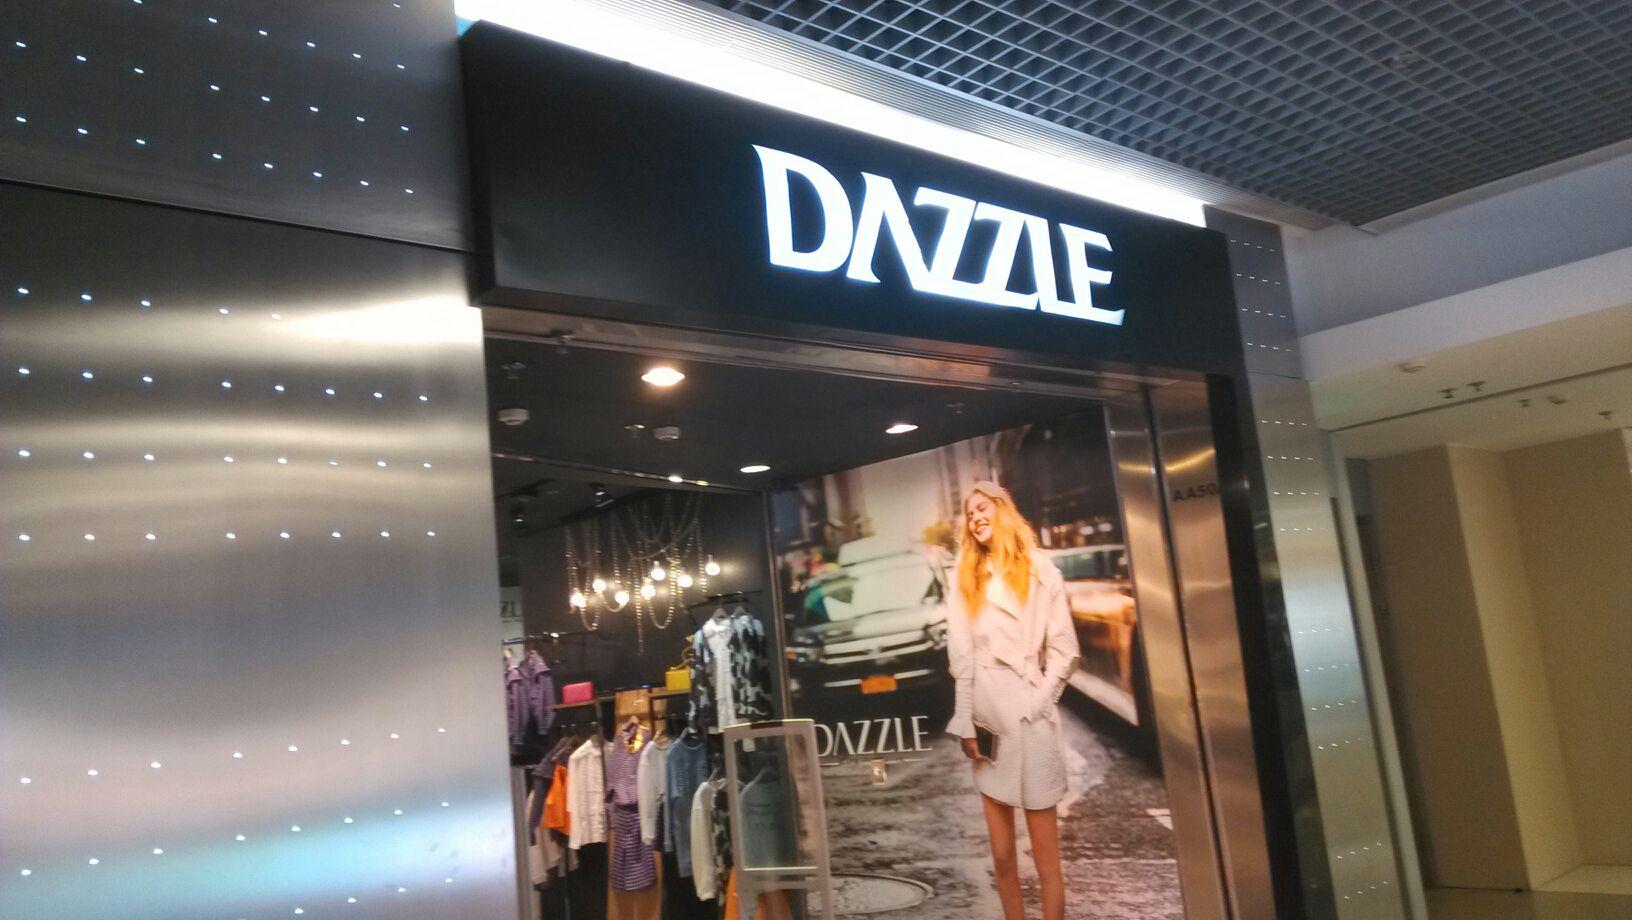 dazzle(北京东方新天地店)图片